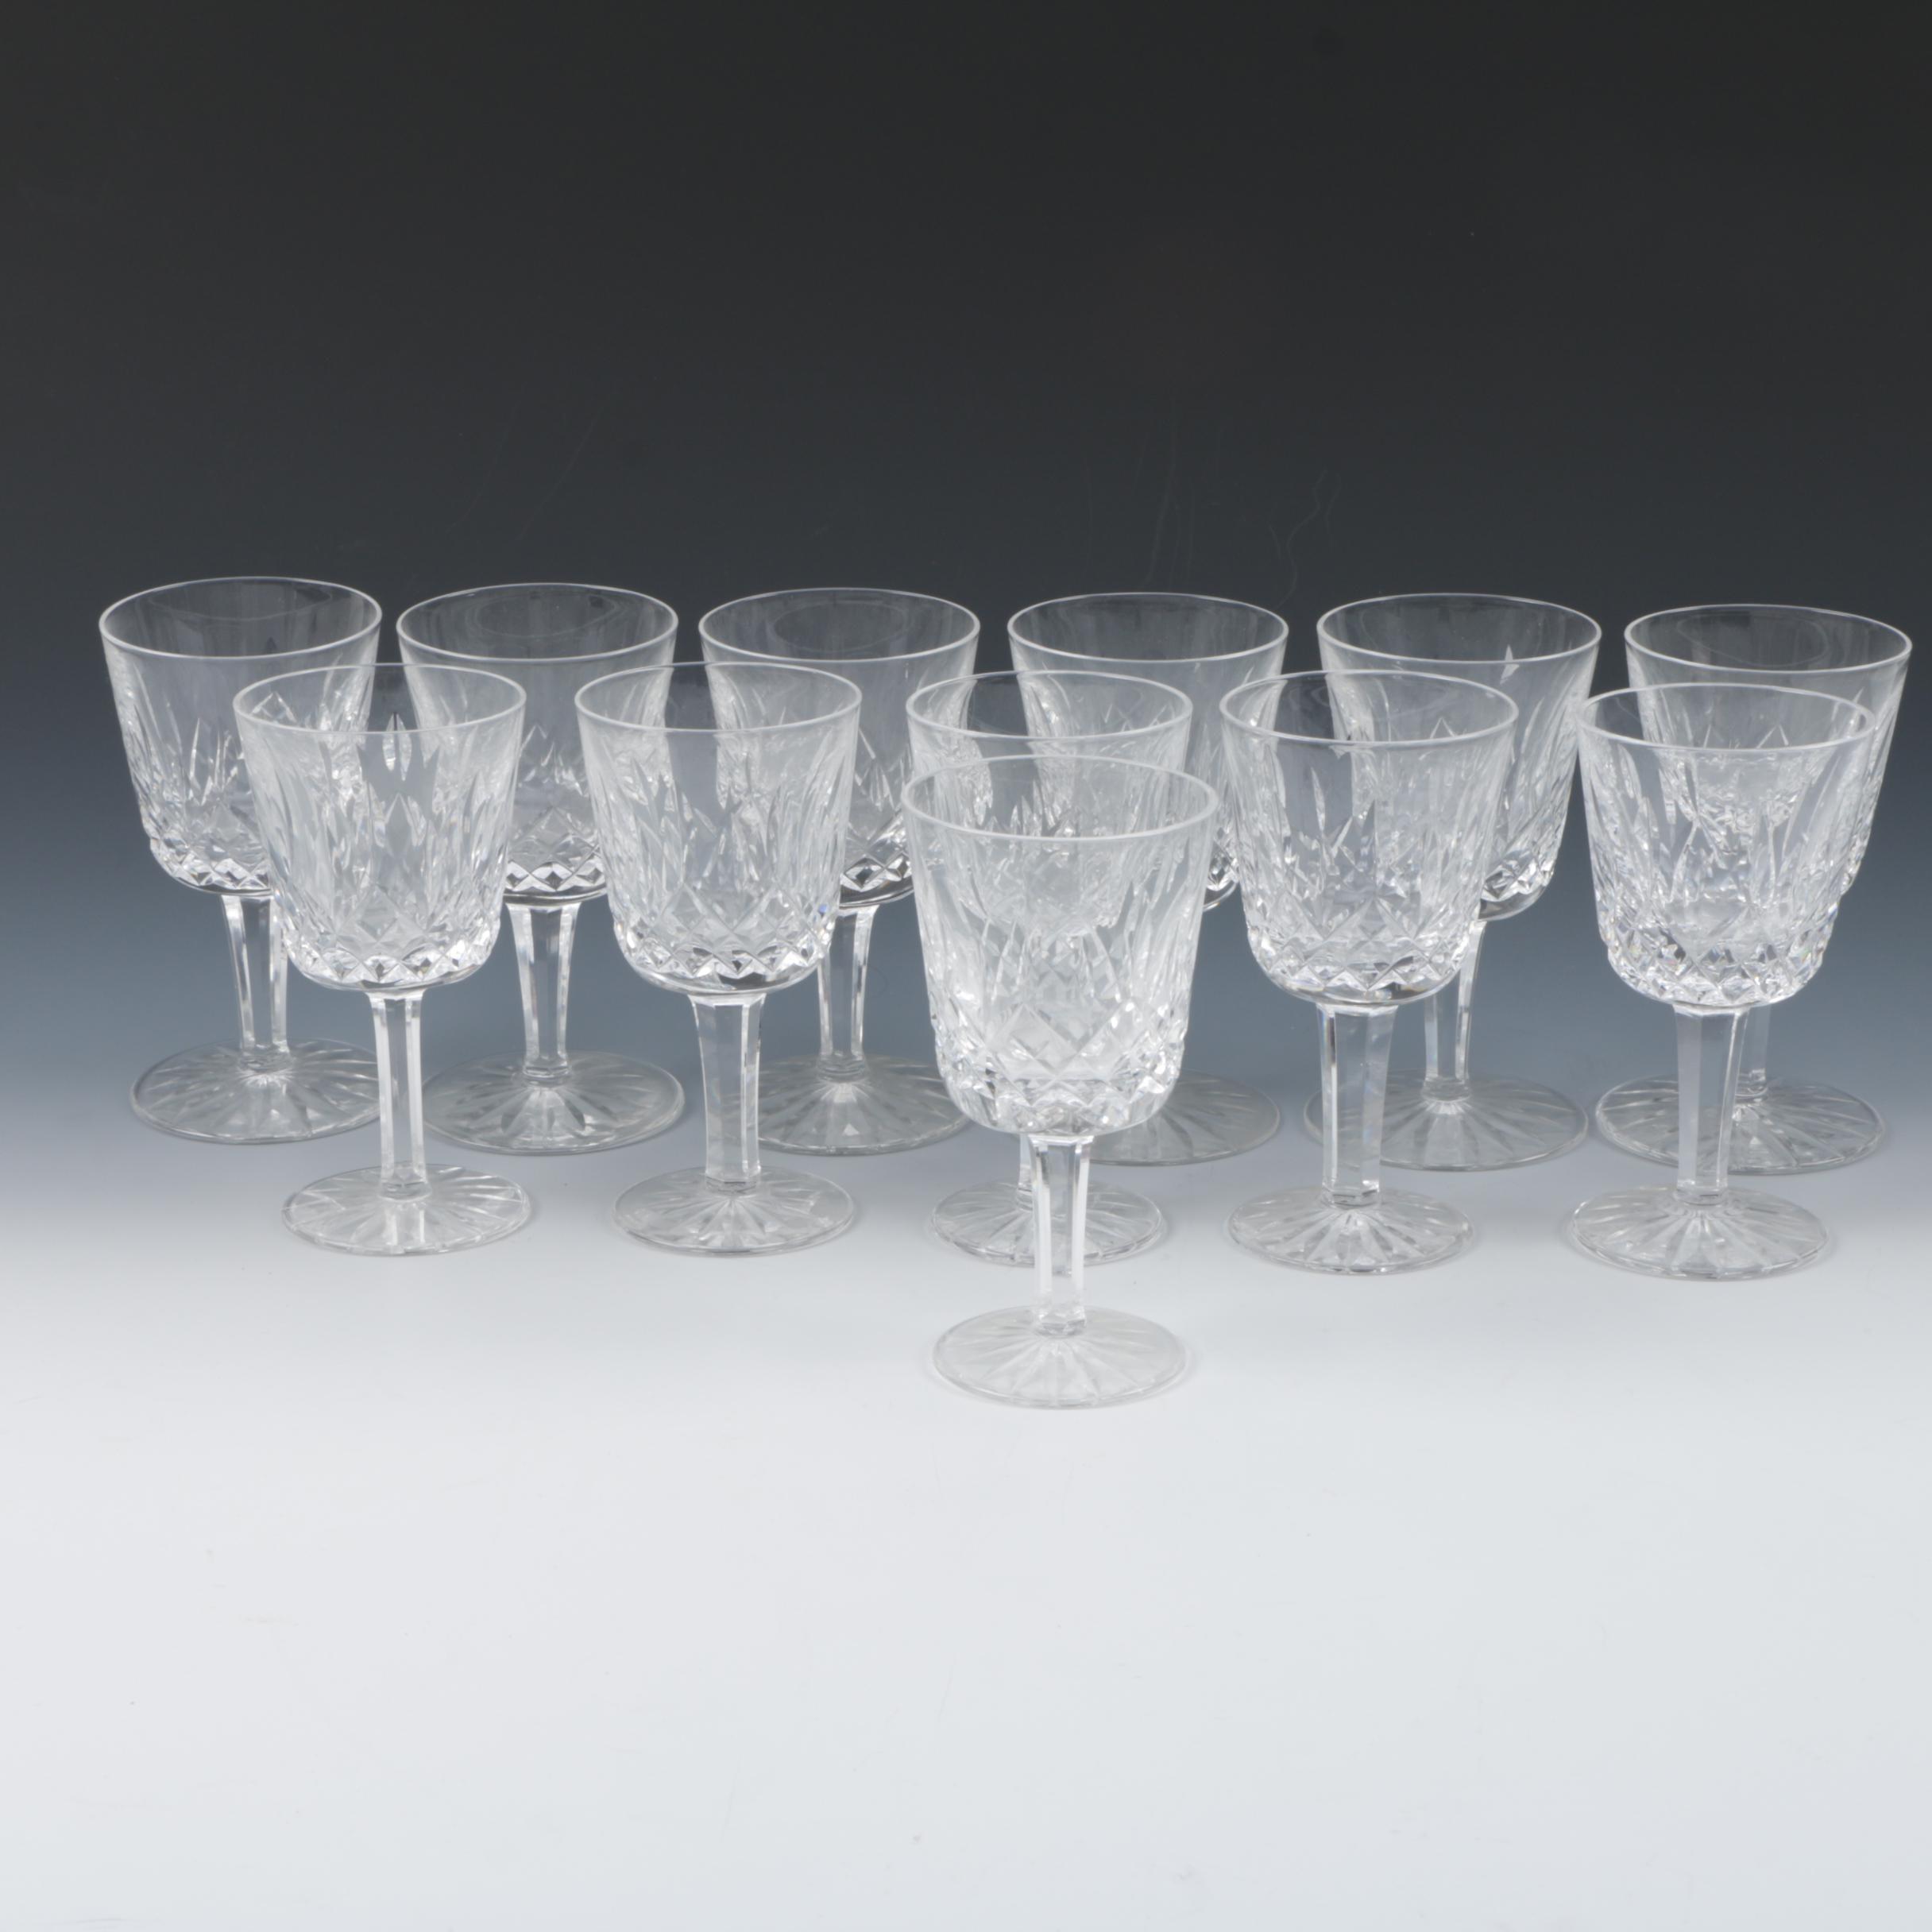 Waterford Crystal 'Lismore' Port Glasses